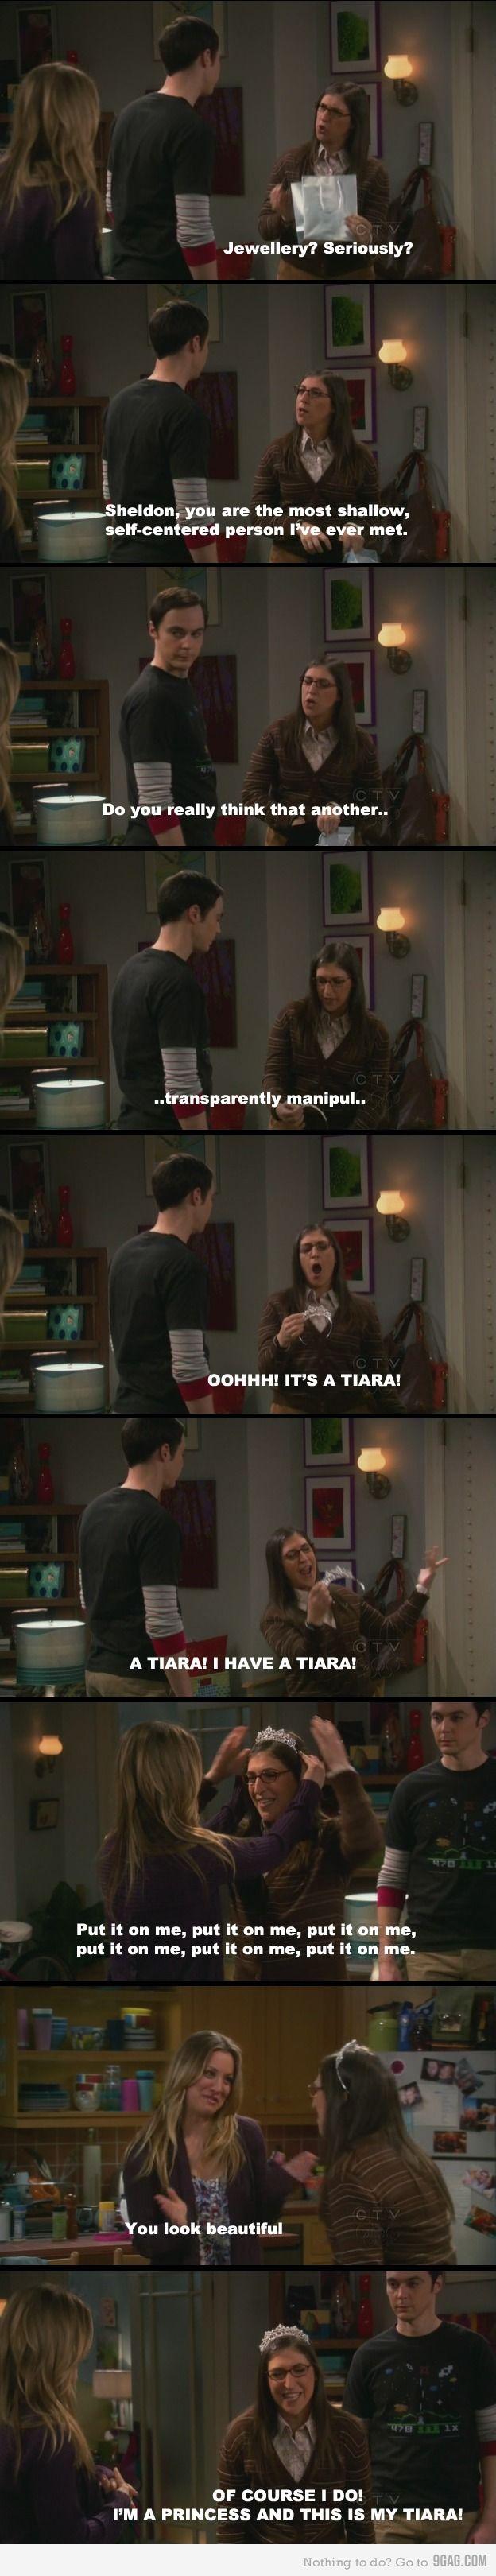 : Girls, Laughing, Favorite Scene, Big Bang Theory, Amy Farrah Fowler, Big Bangs Theory, Funny, Princesses, Tiaras